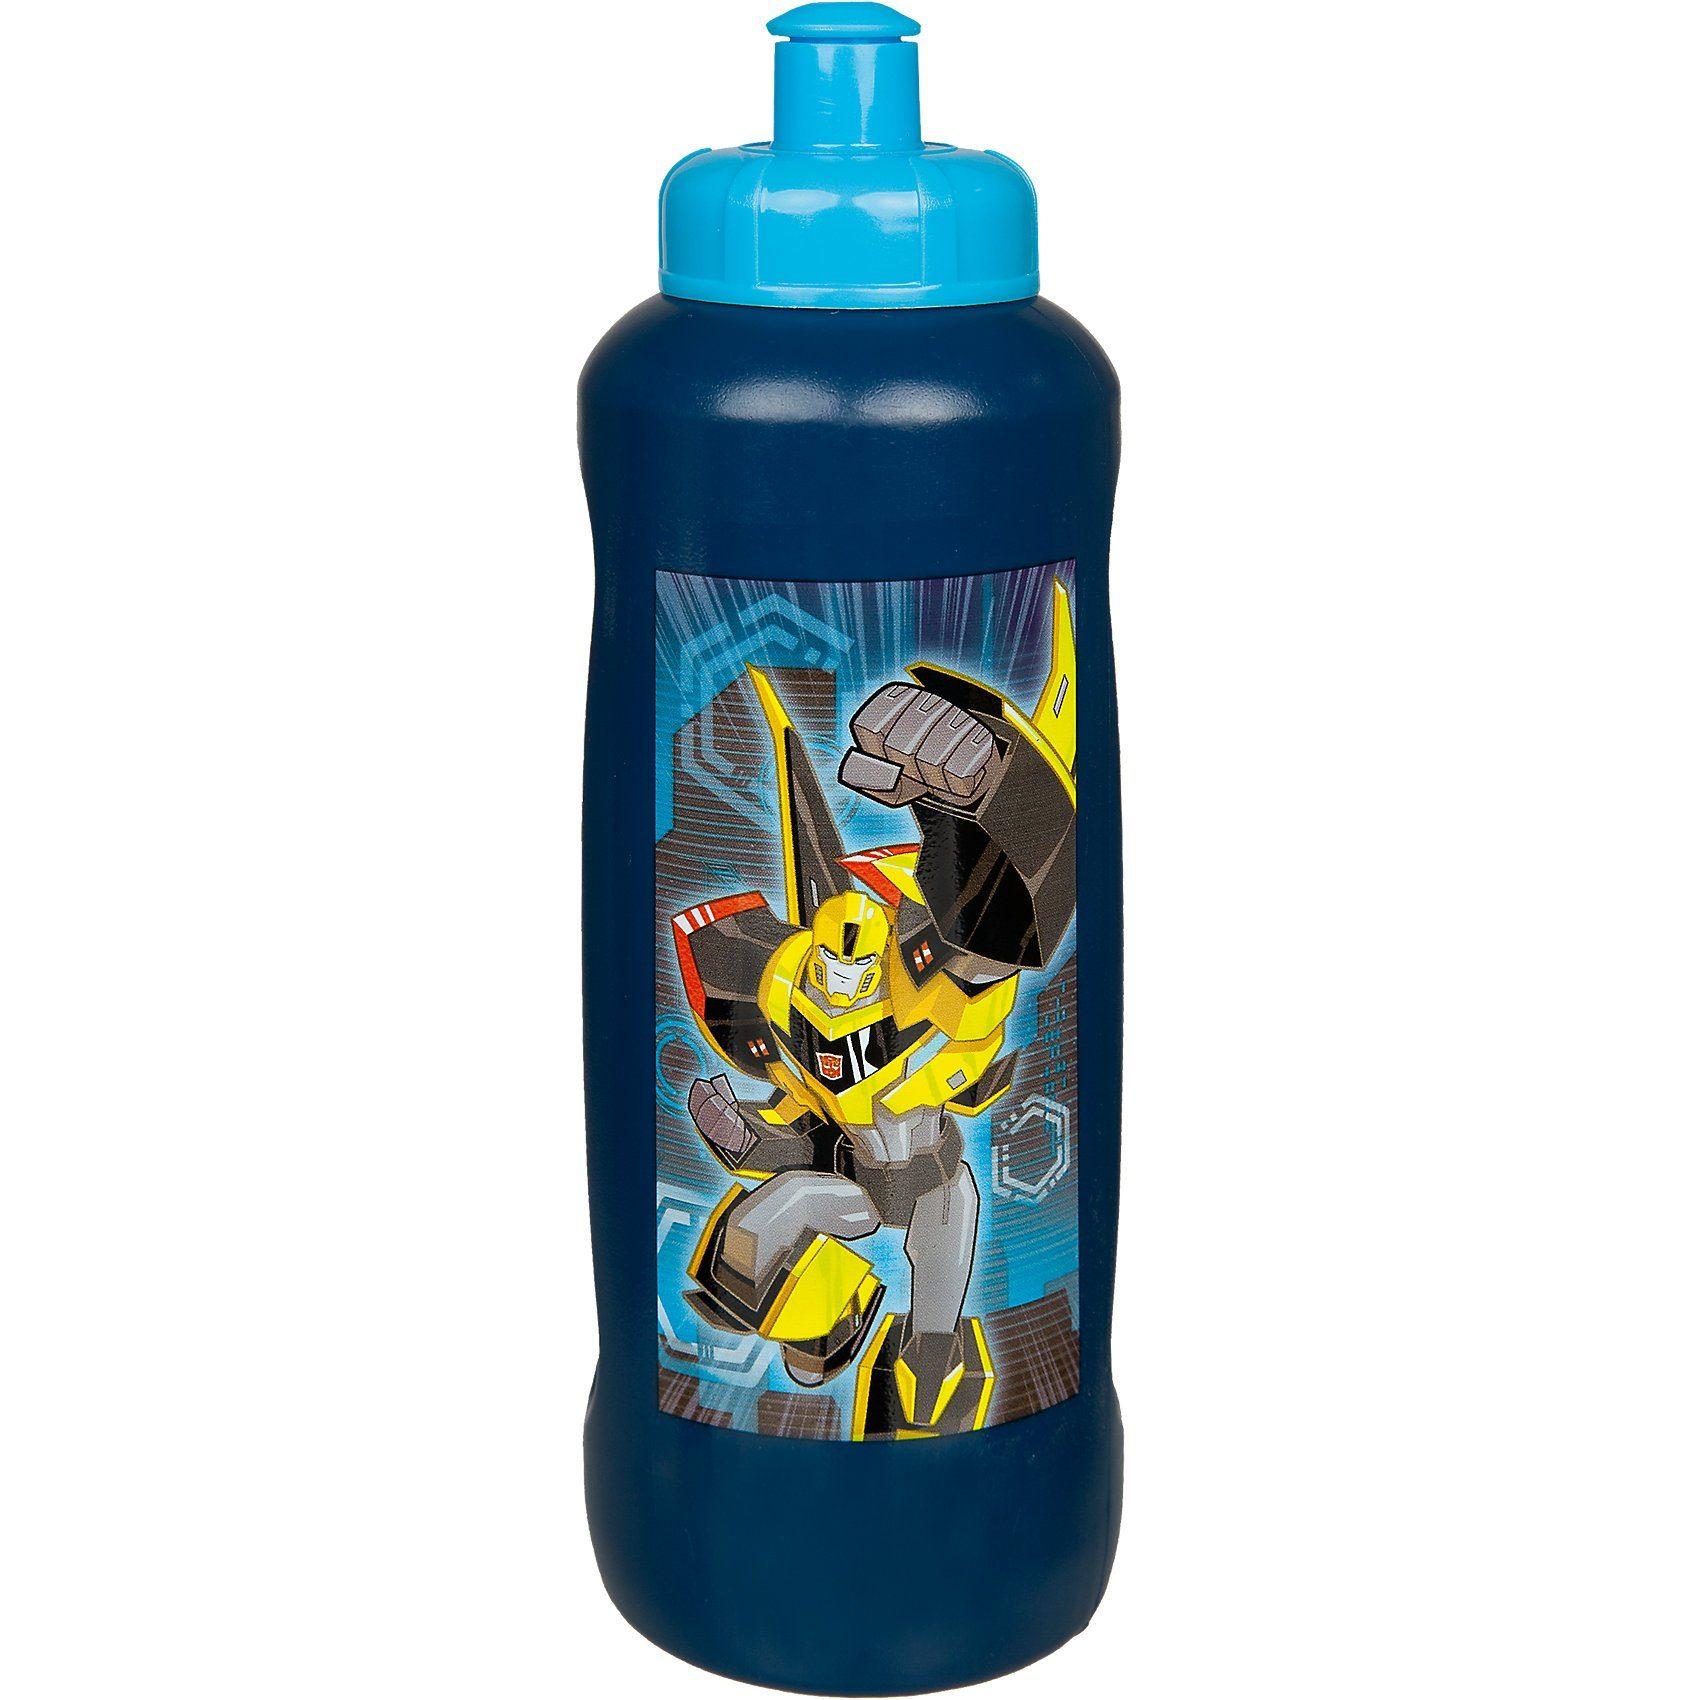 Scooli Trinkflasche Transformers, 450 ml